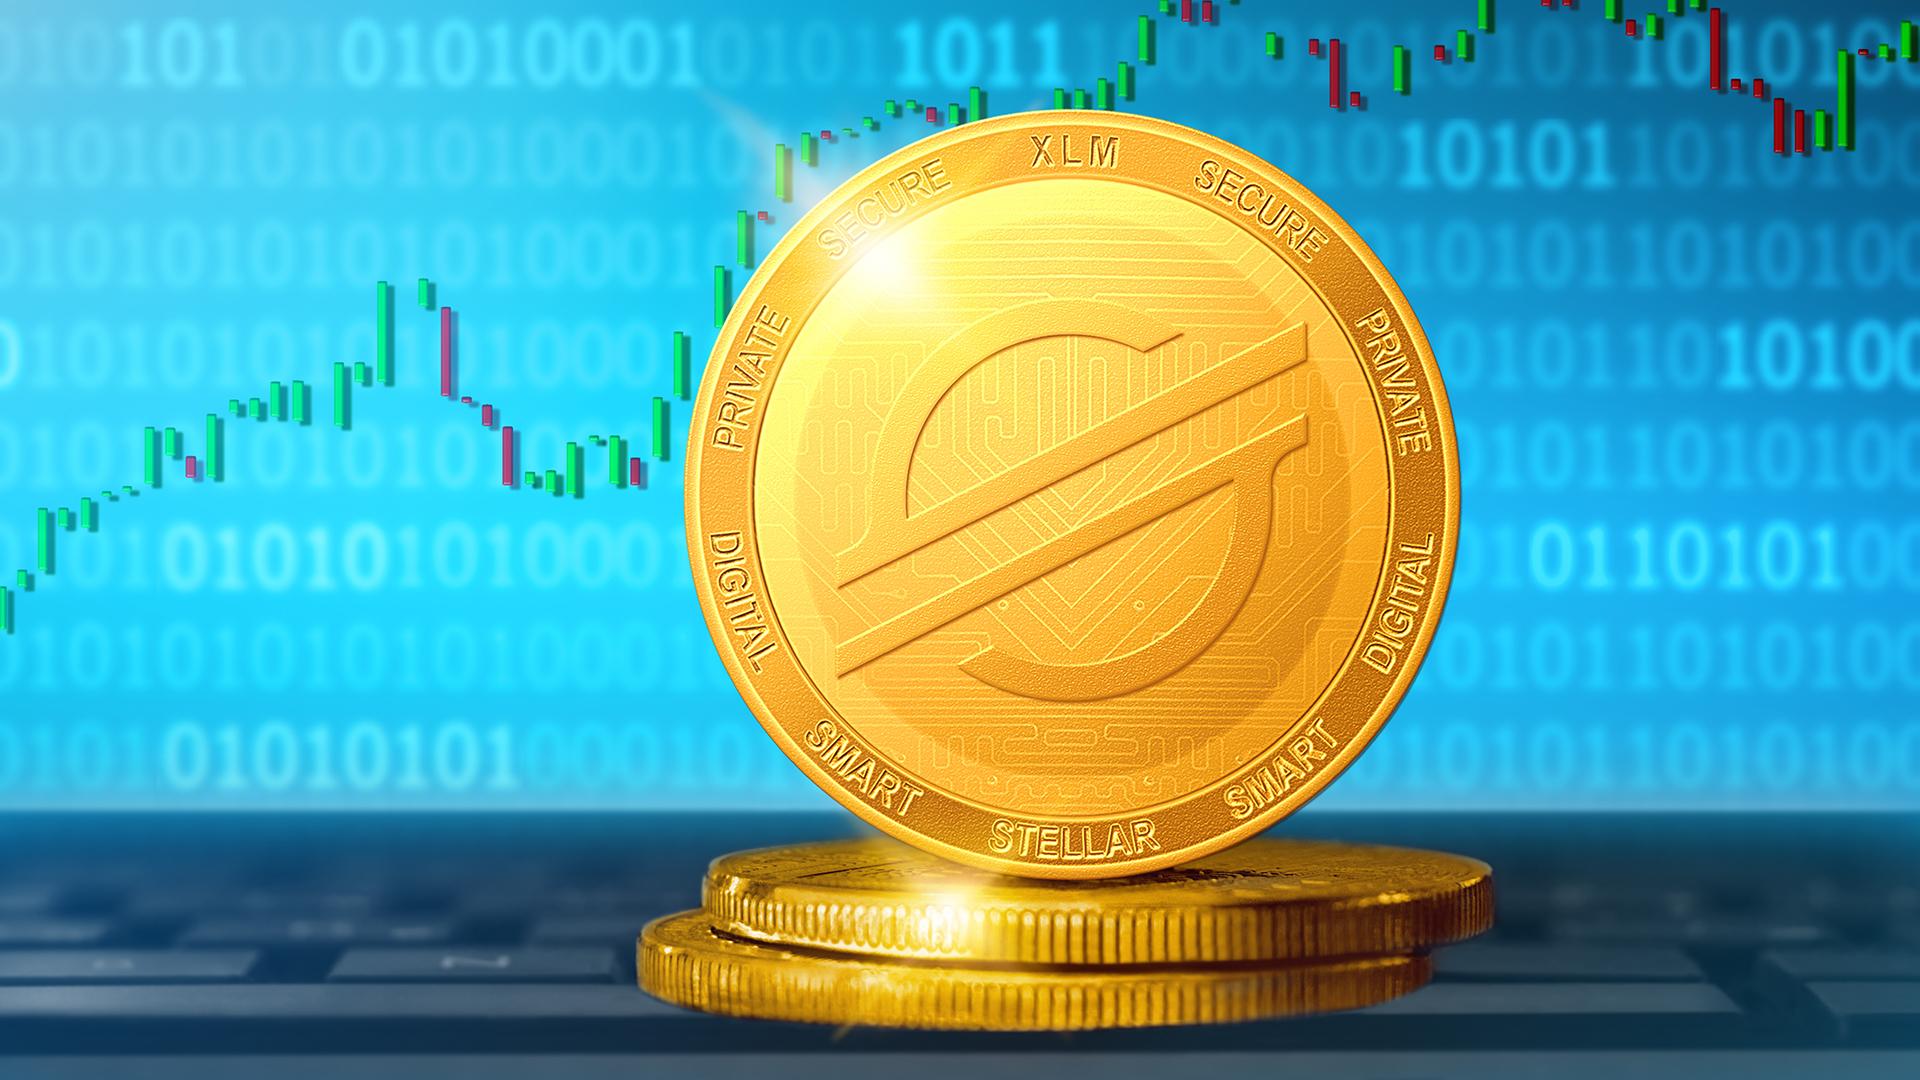 Stellar cryptocurrency